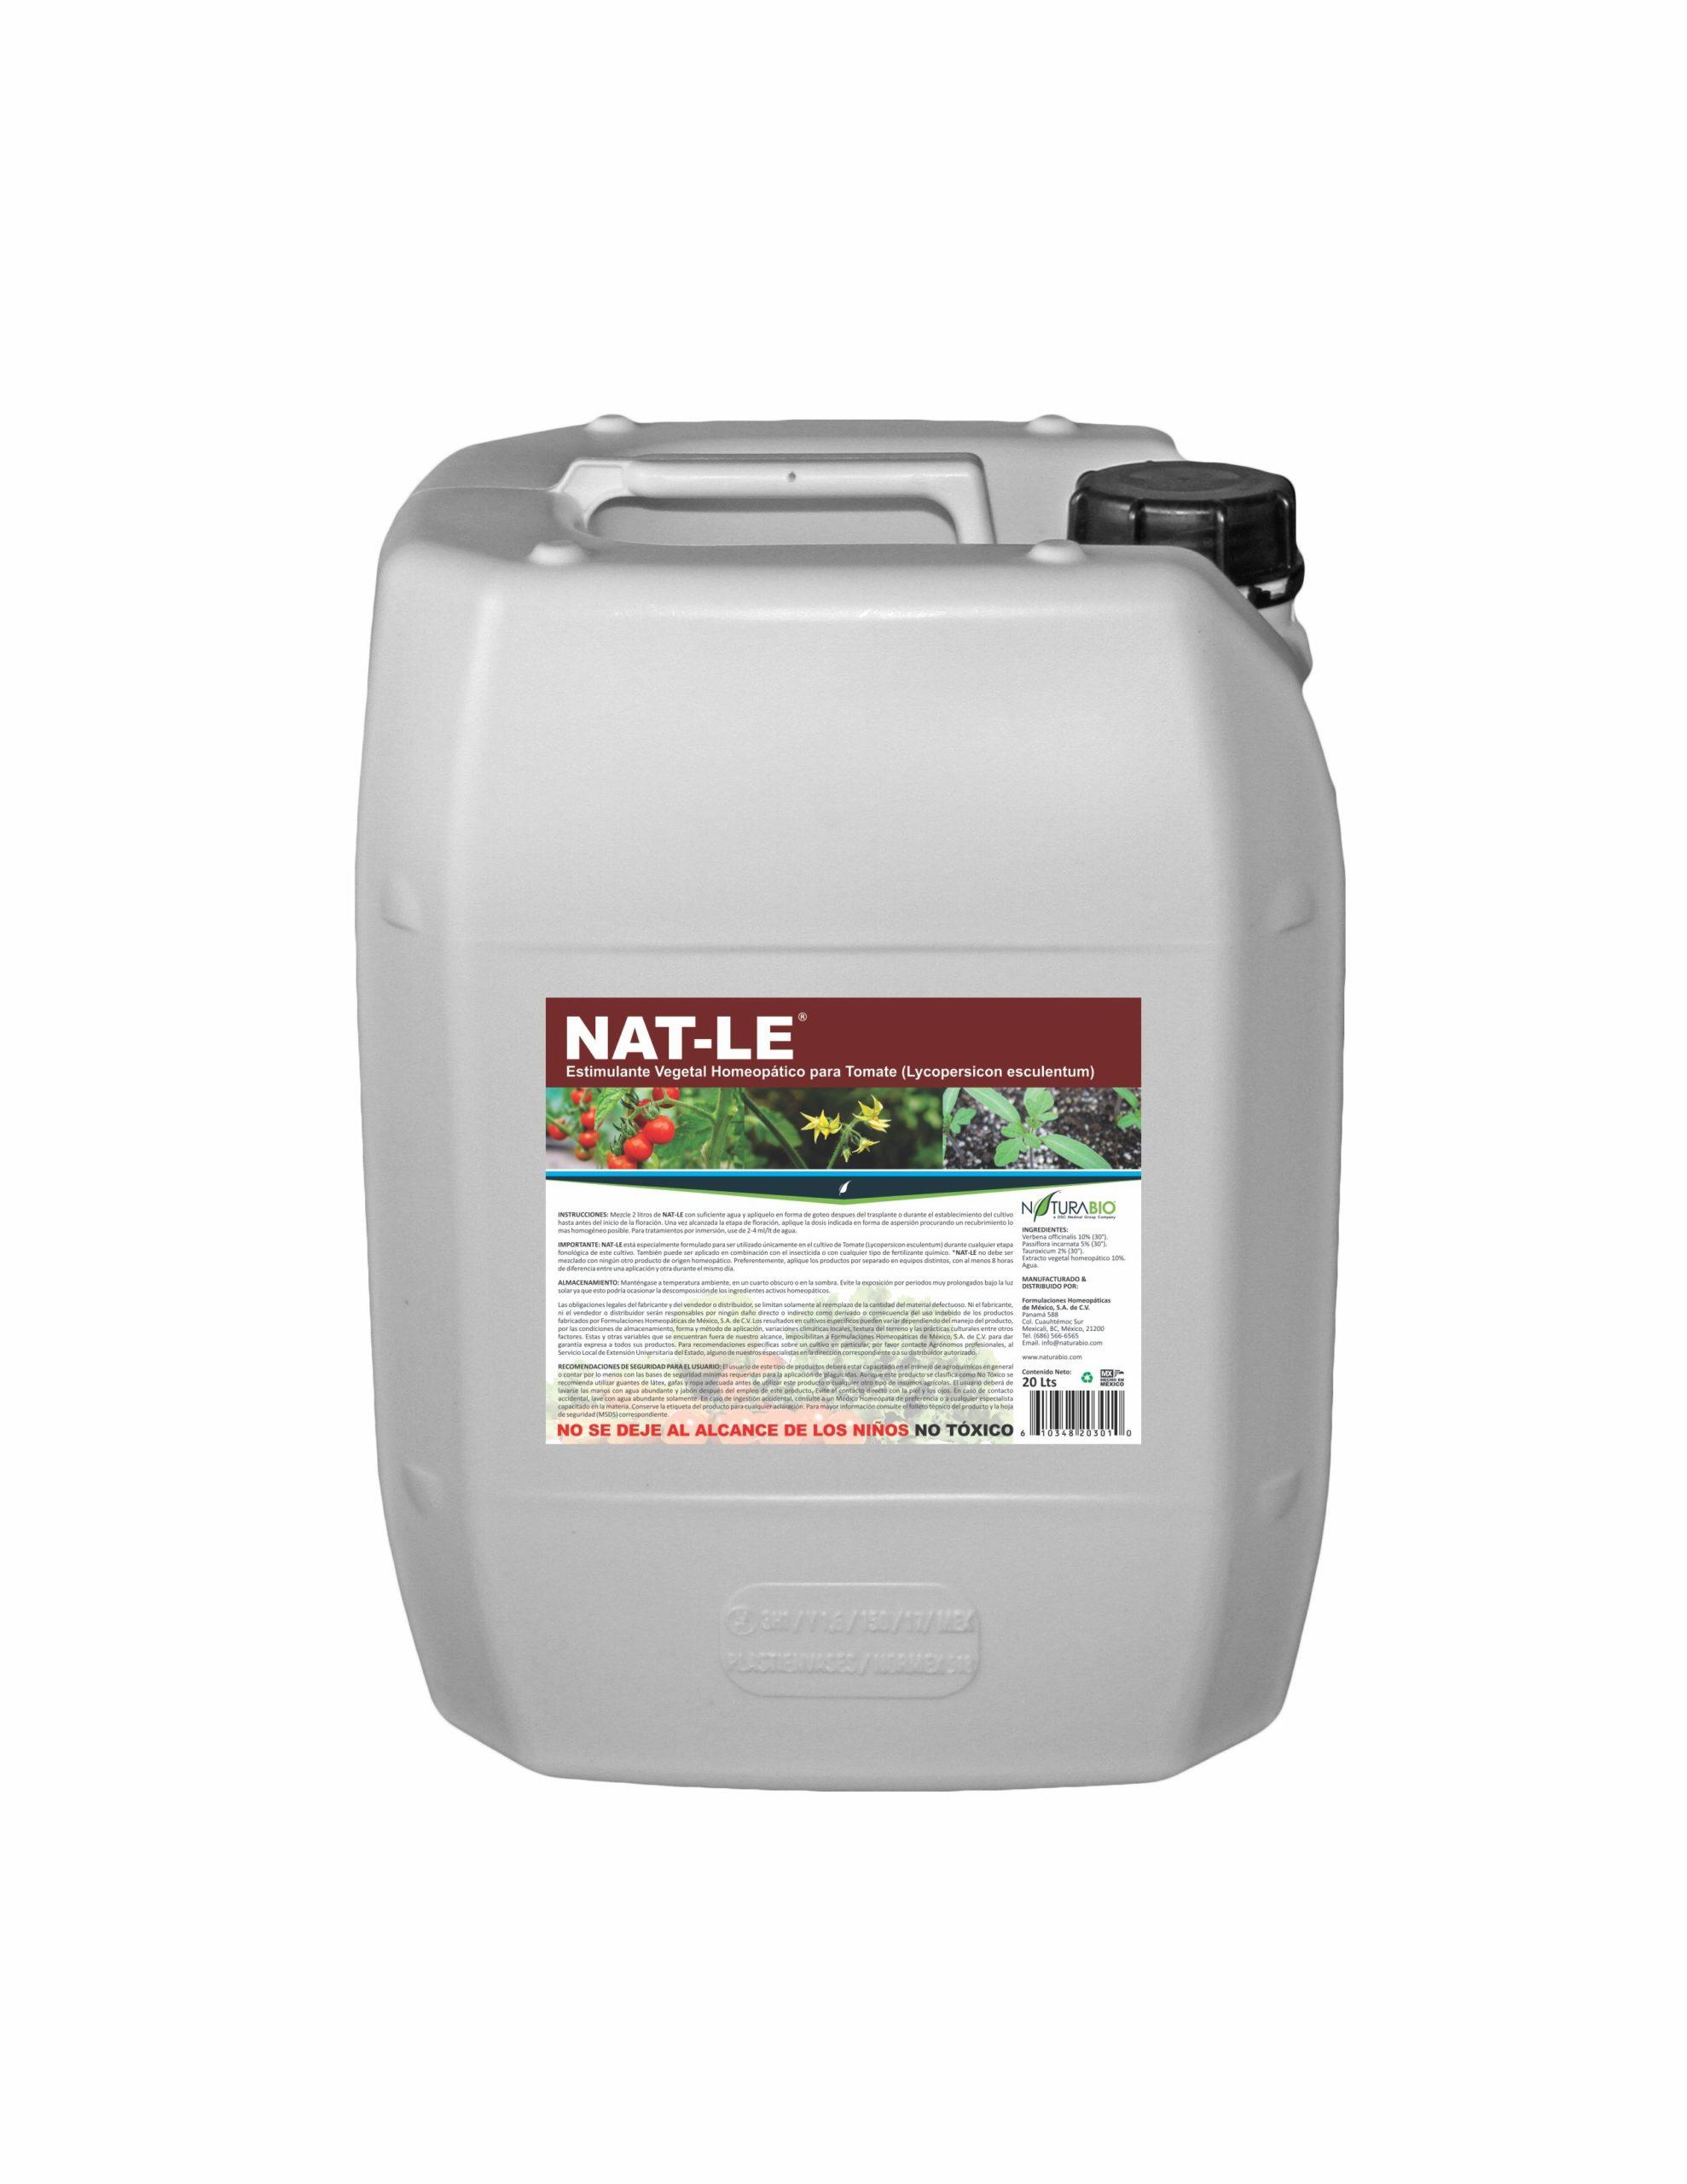 NAT-LE Estimulante Vegetal Homeopático para Tomate